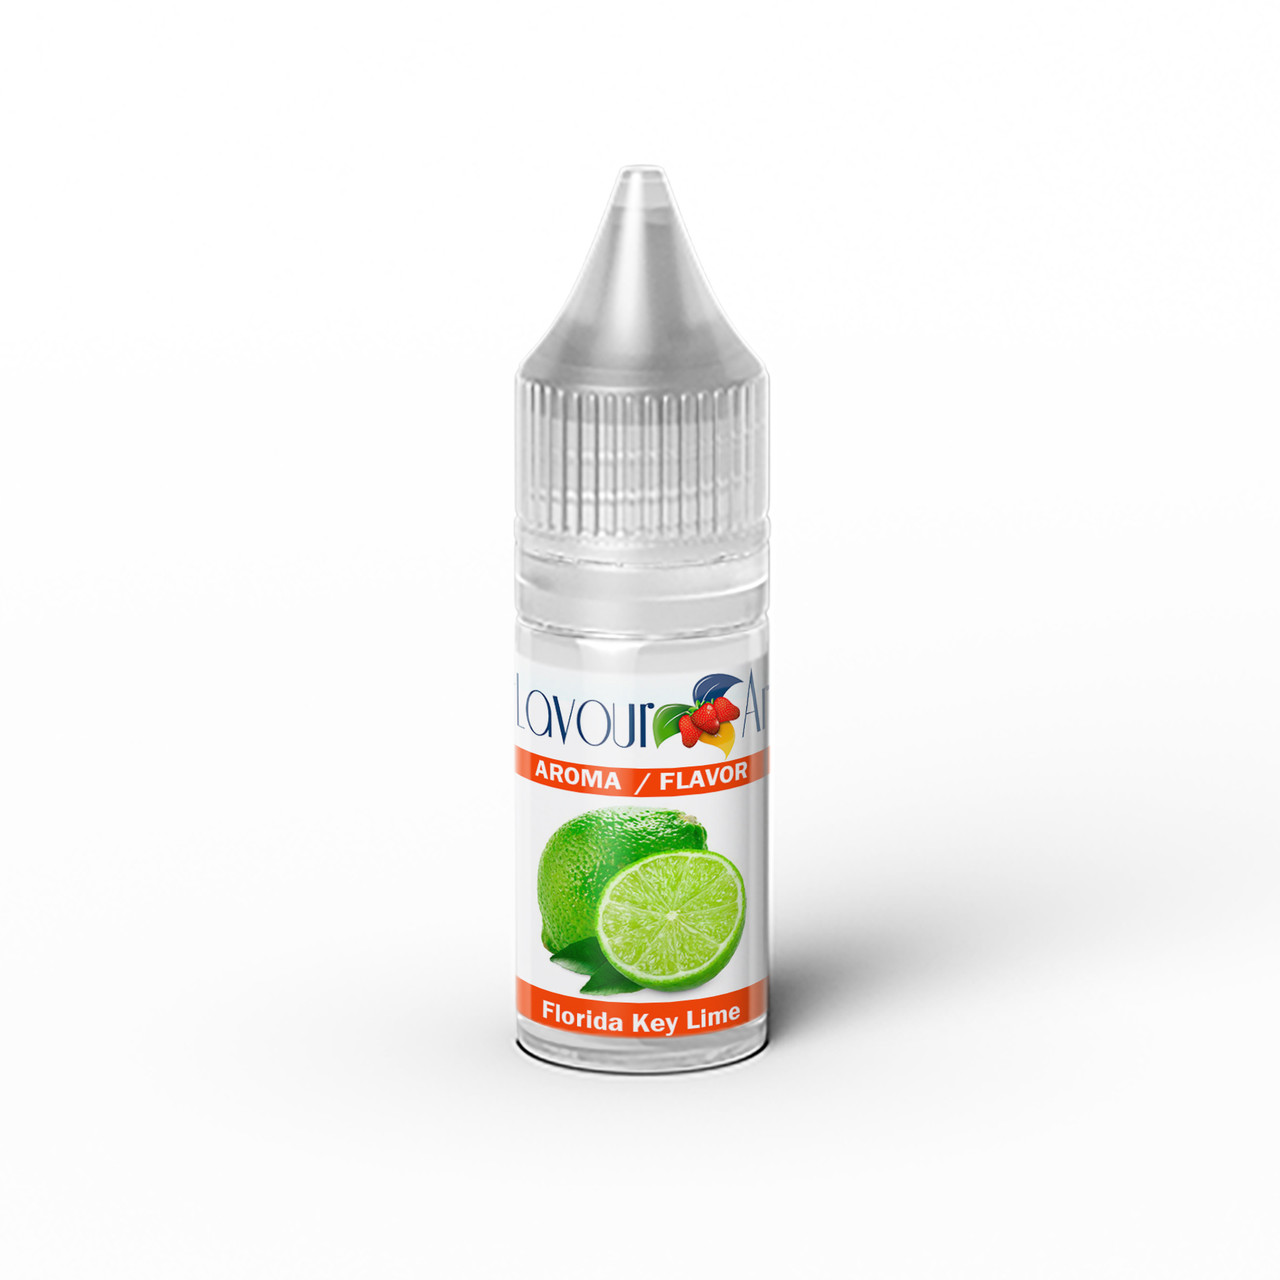 Ароматизатор FlavourArt Florida Key Lime, 10 мл.